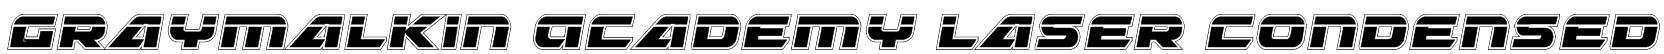 Graymalkin Academy Laser Condensed Font